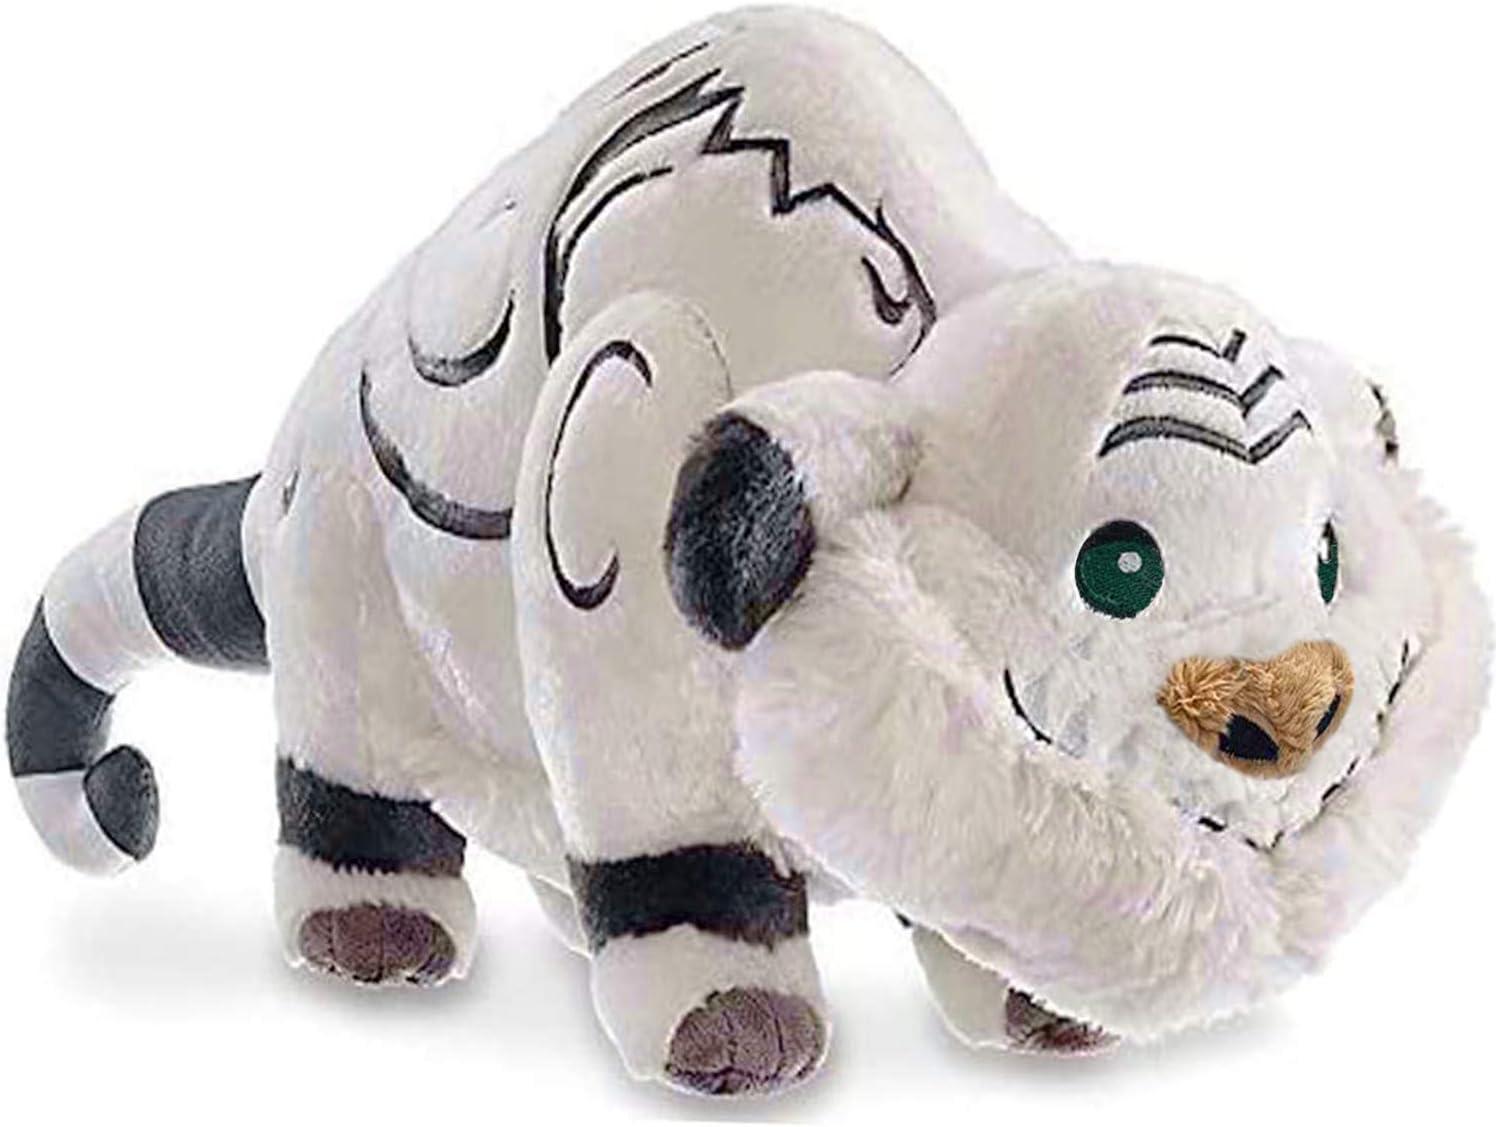 Cuecutie Neverbeast Plush Anime Tiger Doll Stuffed Soft Toy Pillow Decor Collectible Plush Toy Kids Birthday20